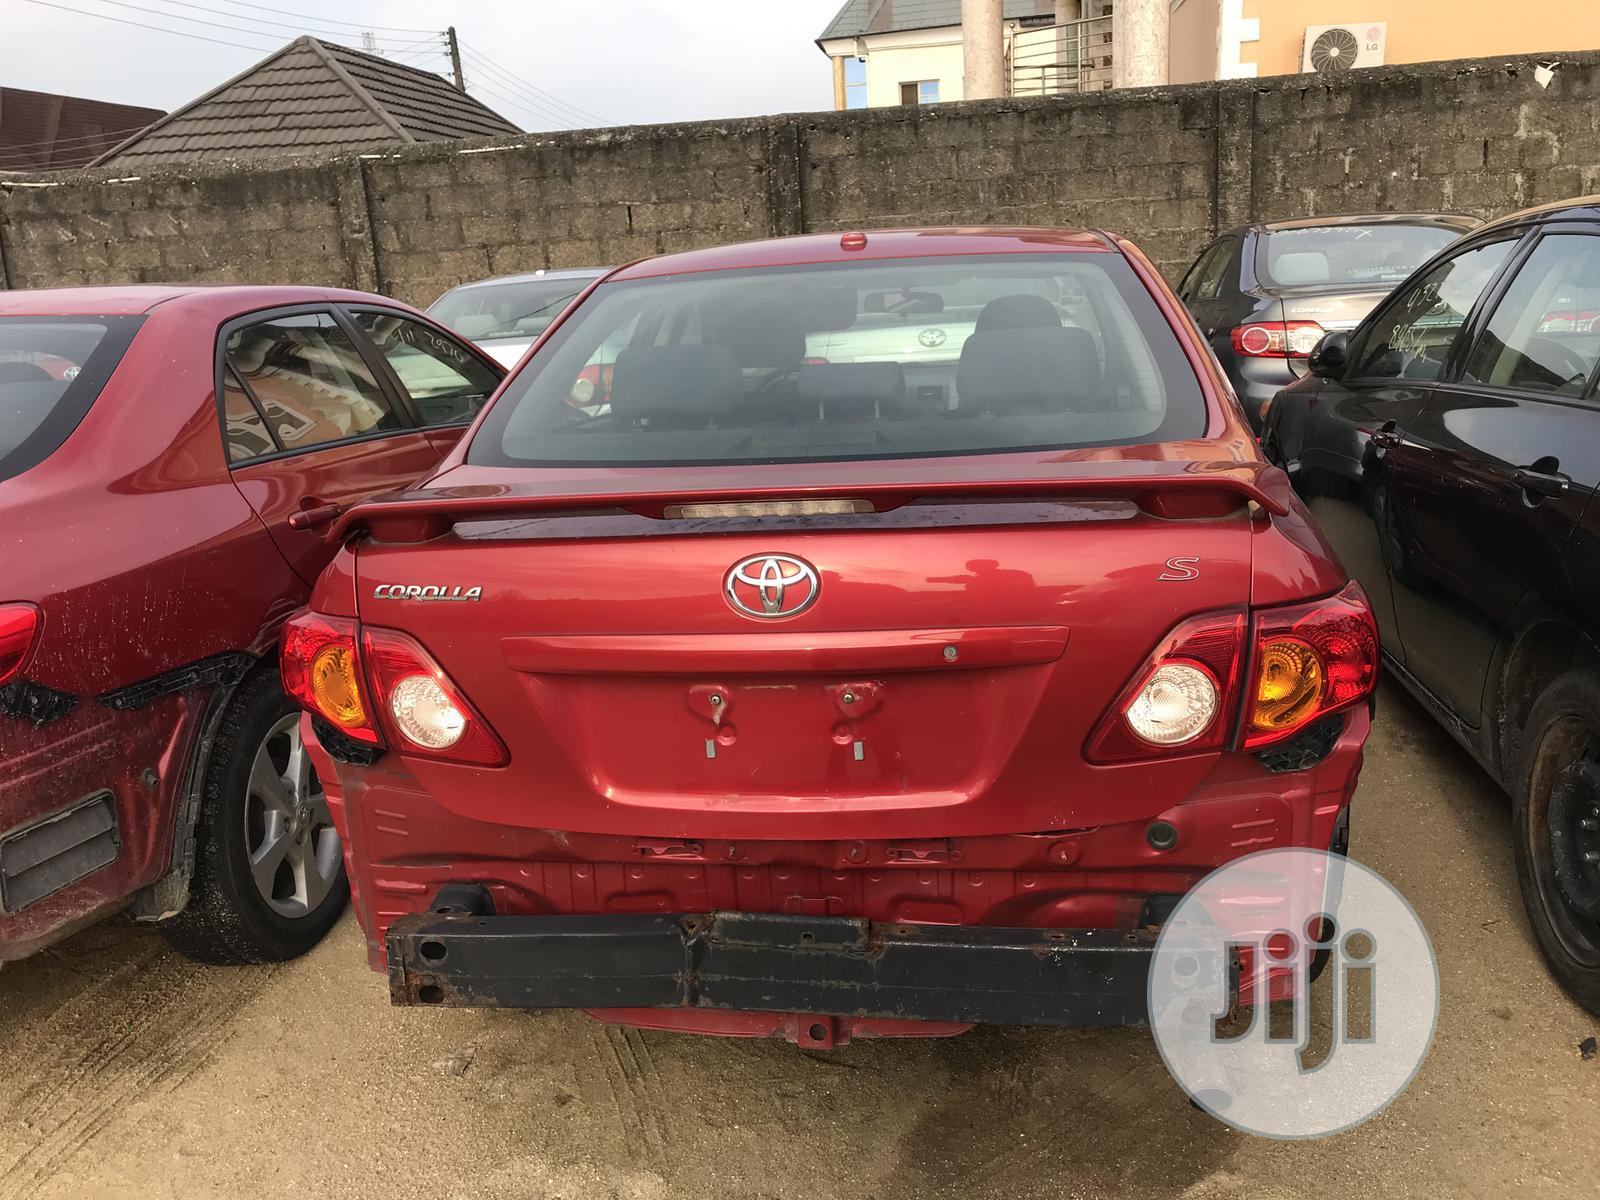 Toyota Corolla 2010 | Cars for sale in Amuwo-Odofin, Lagos State, Nigeria